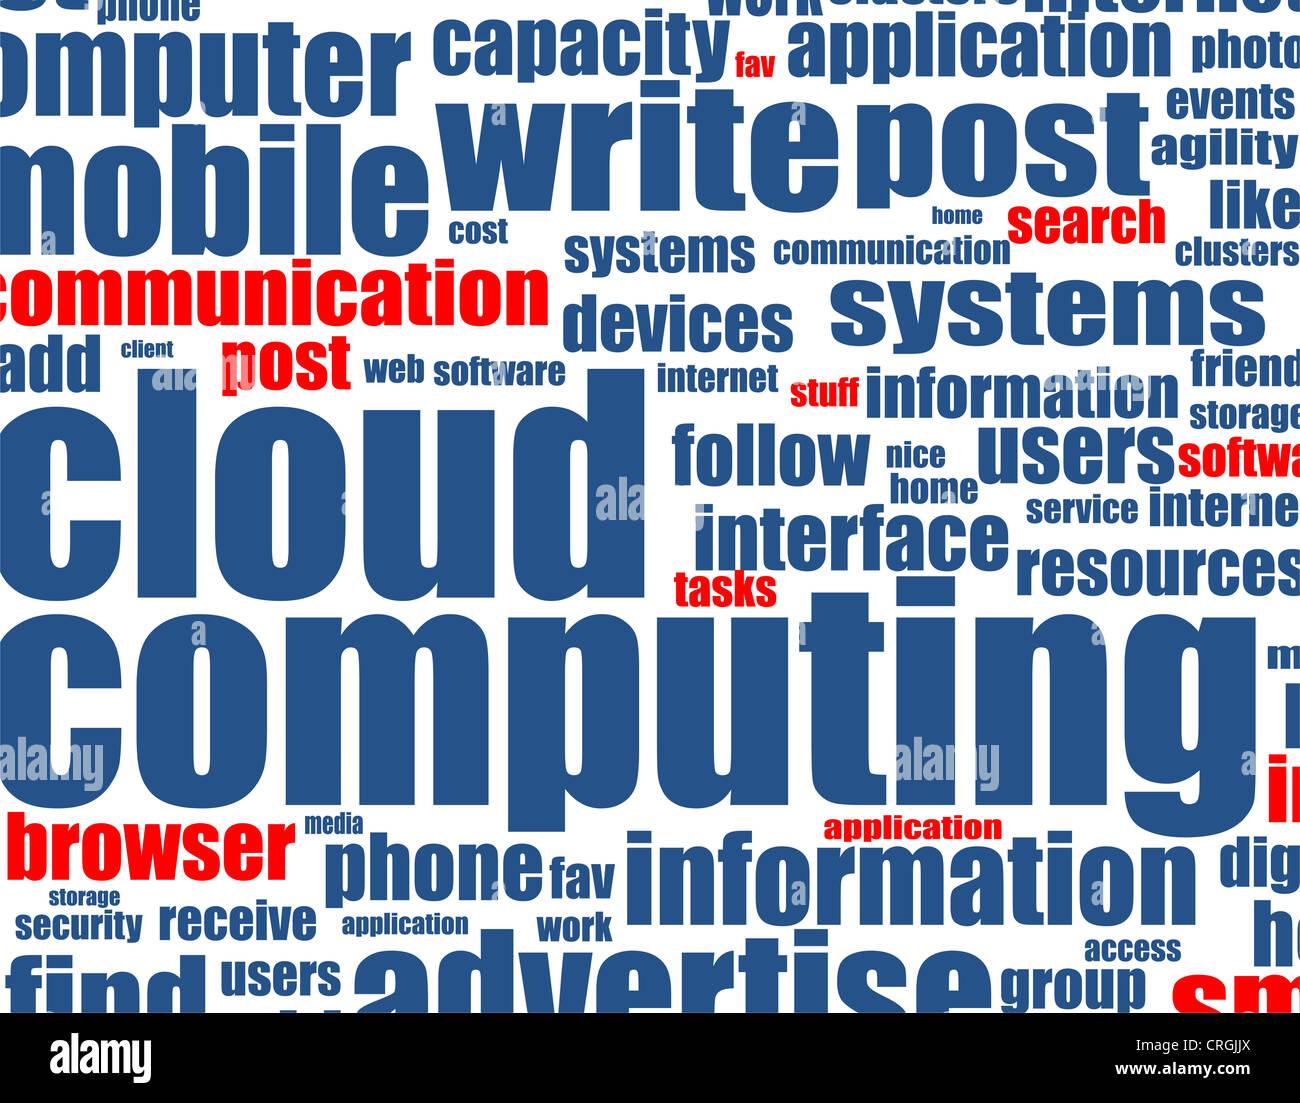 Cloud-computing - word-Hintergrund Stockfoto